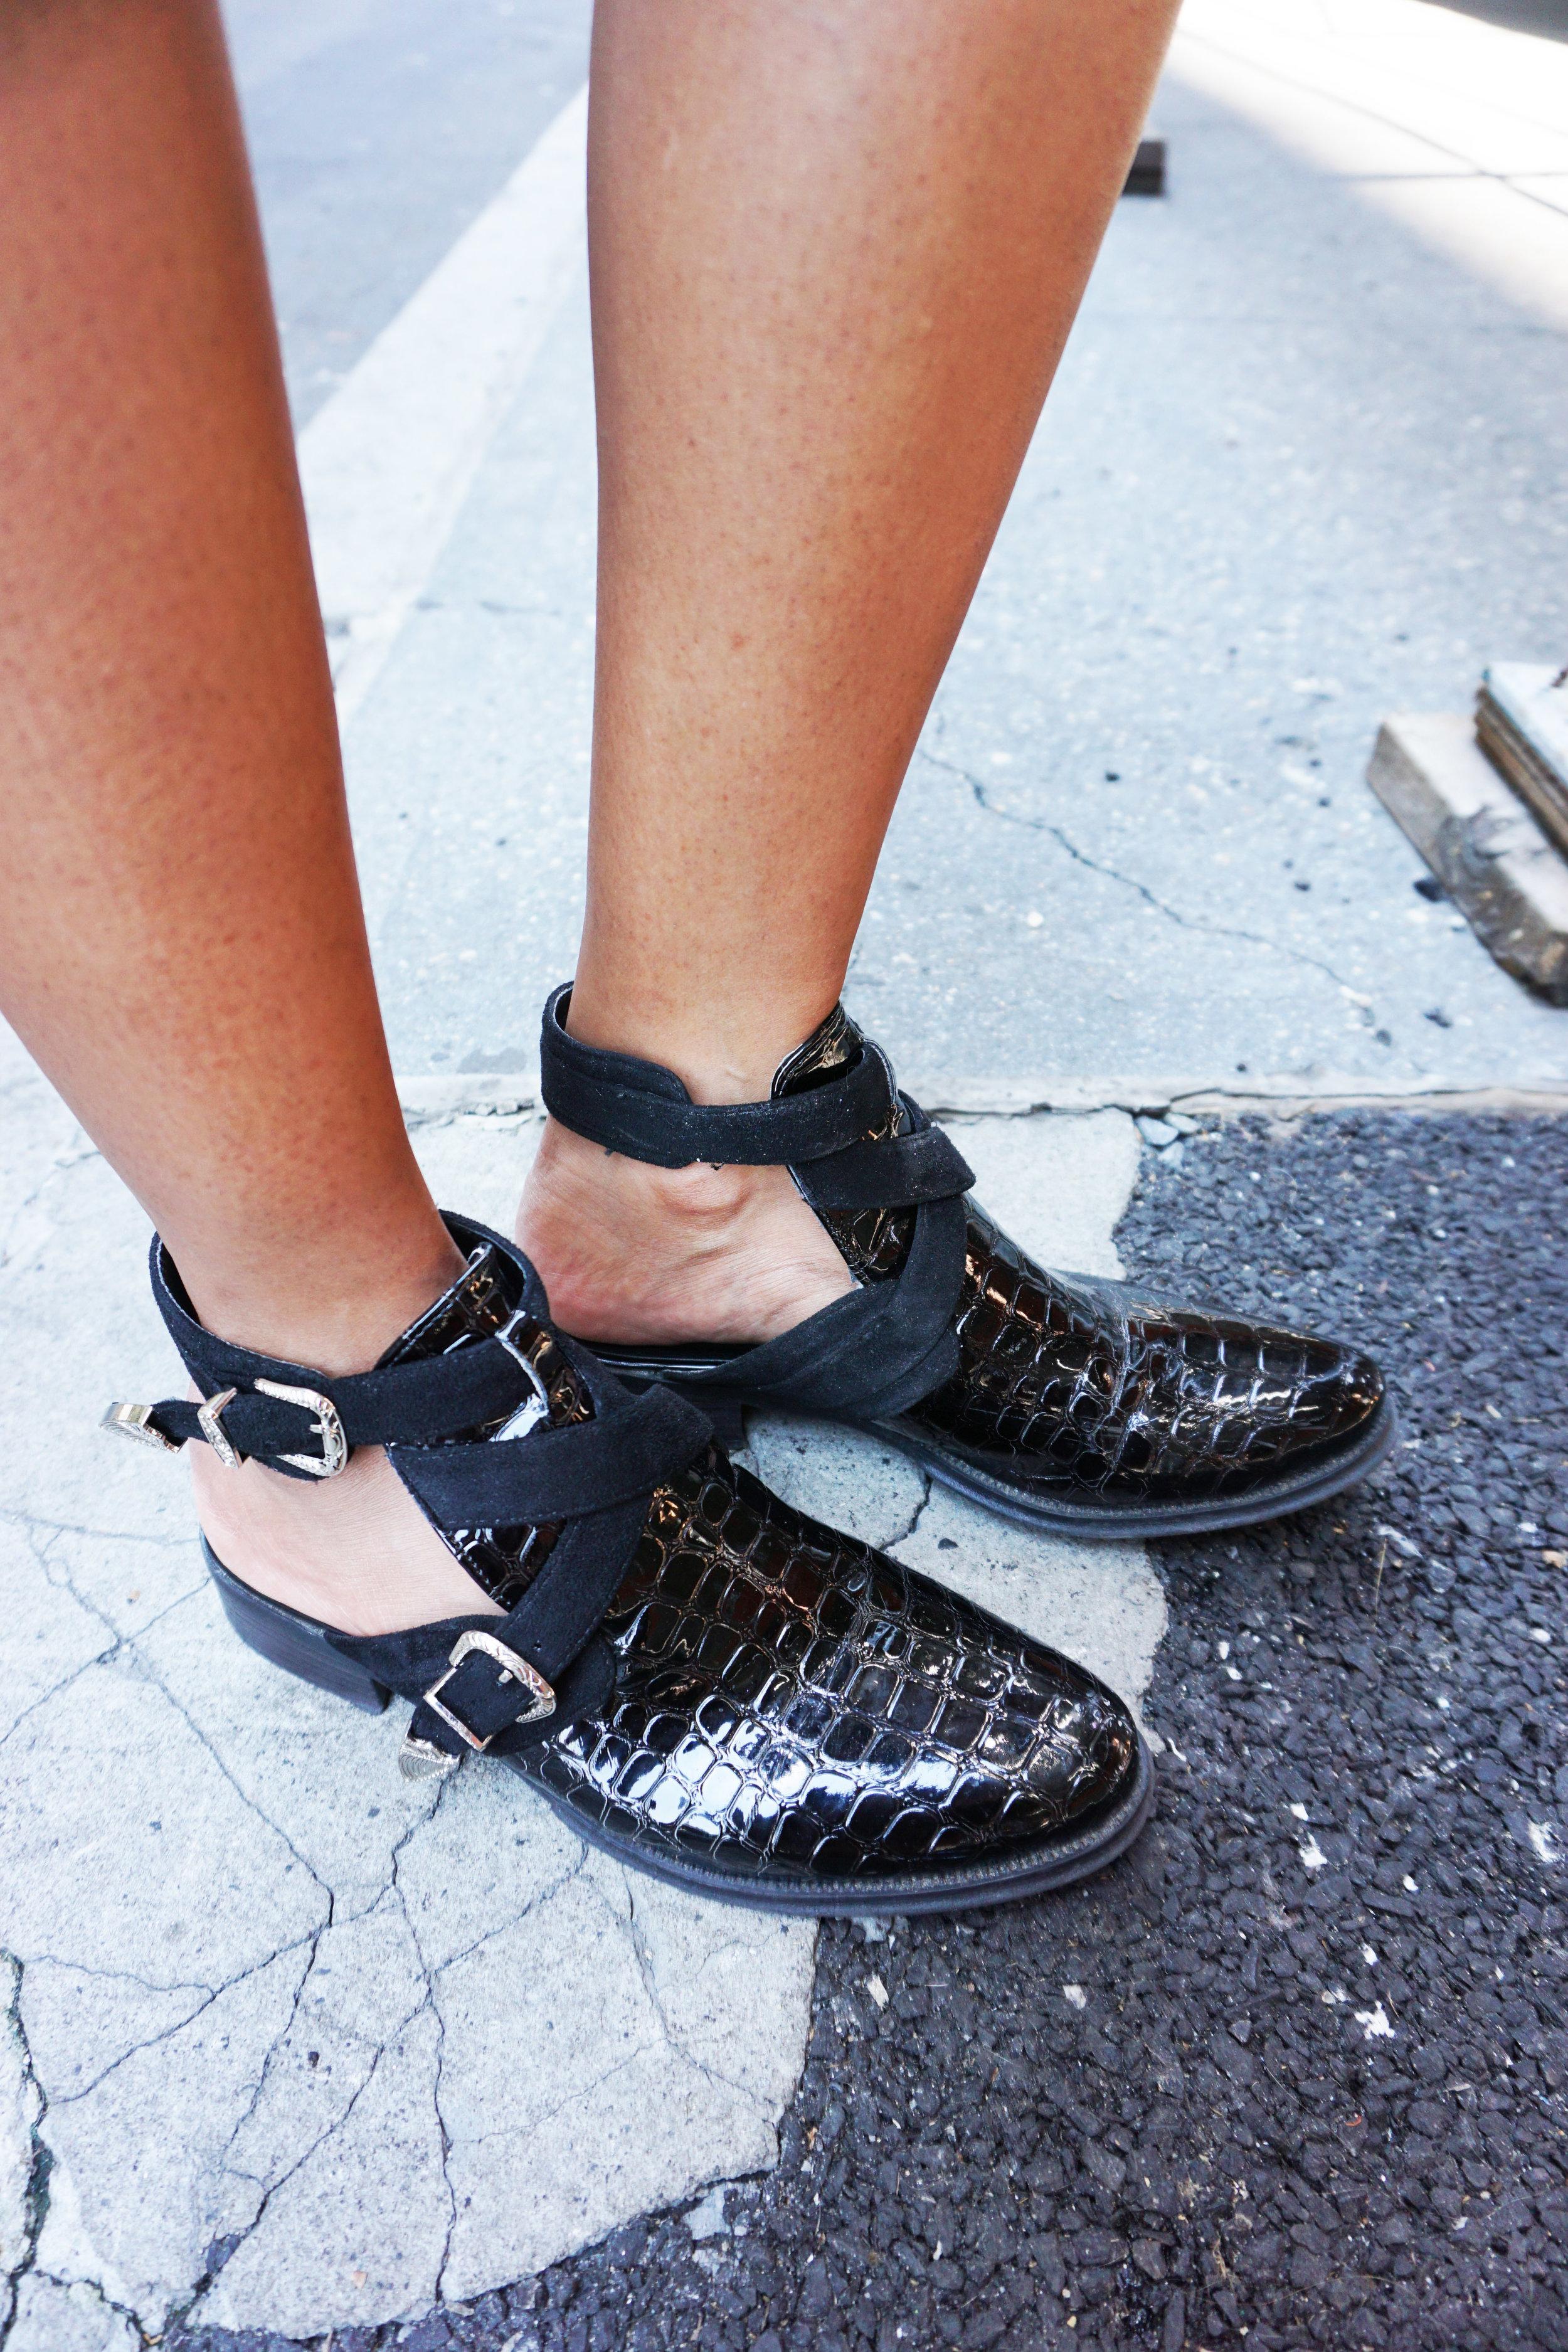 Top - Forever 21   Skirt - H&M   Blazer - Forever 21   Shoes - ASOS   Bracelet - Jewelmint   Bodychain - Jewelmint